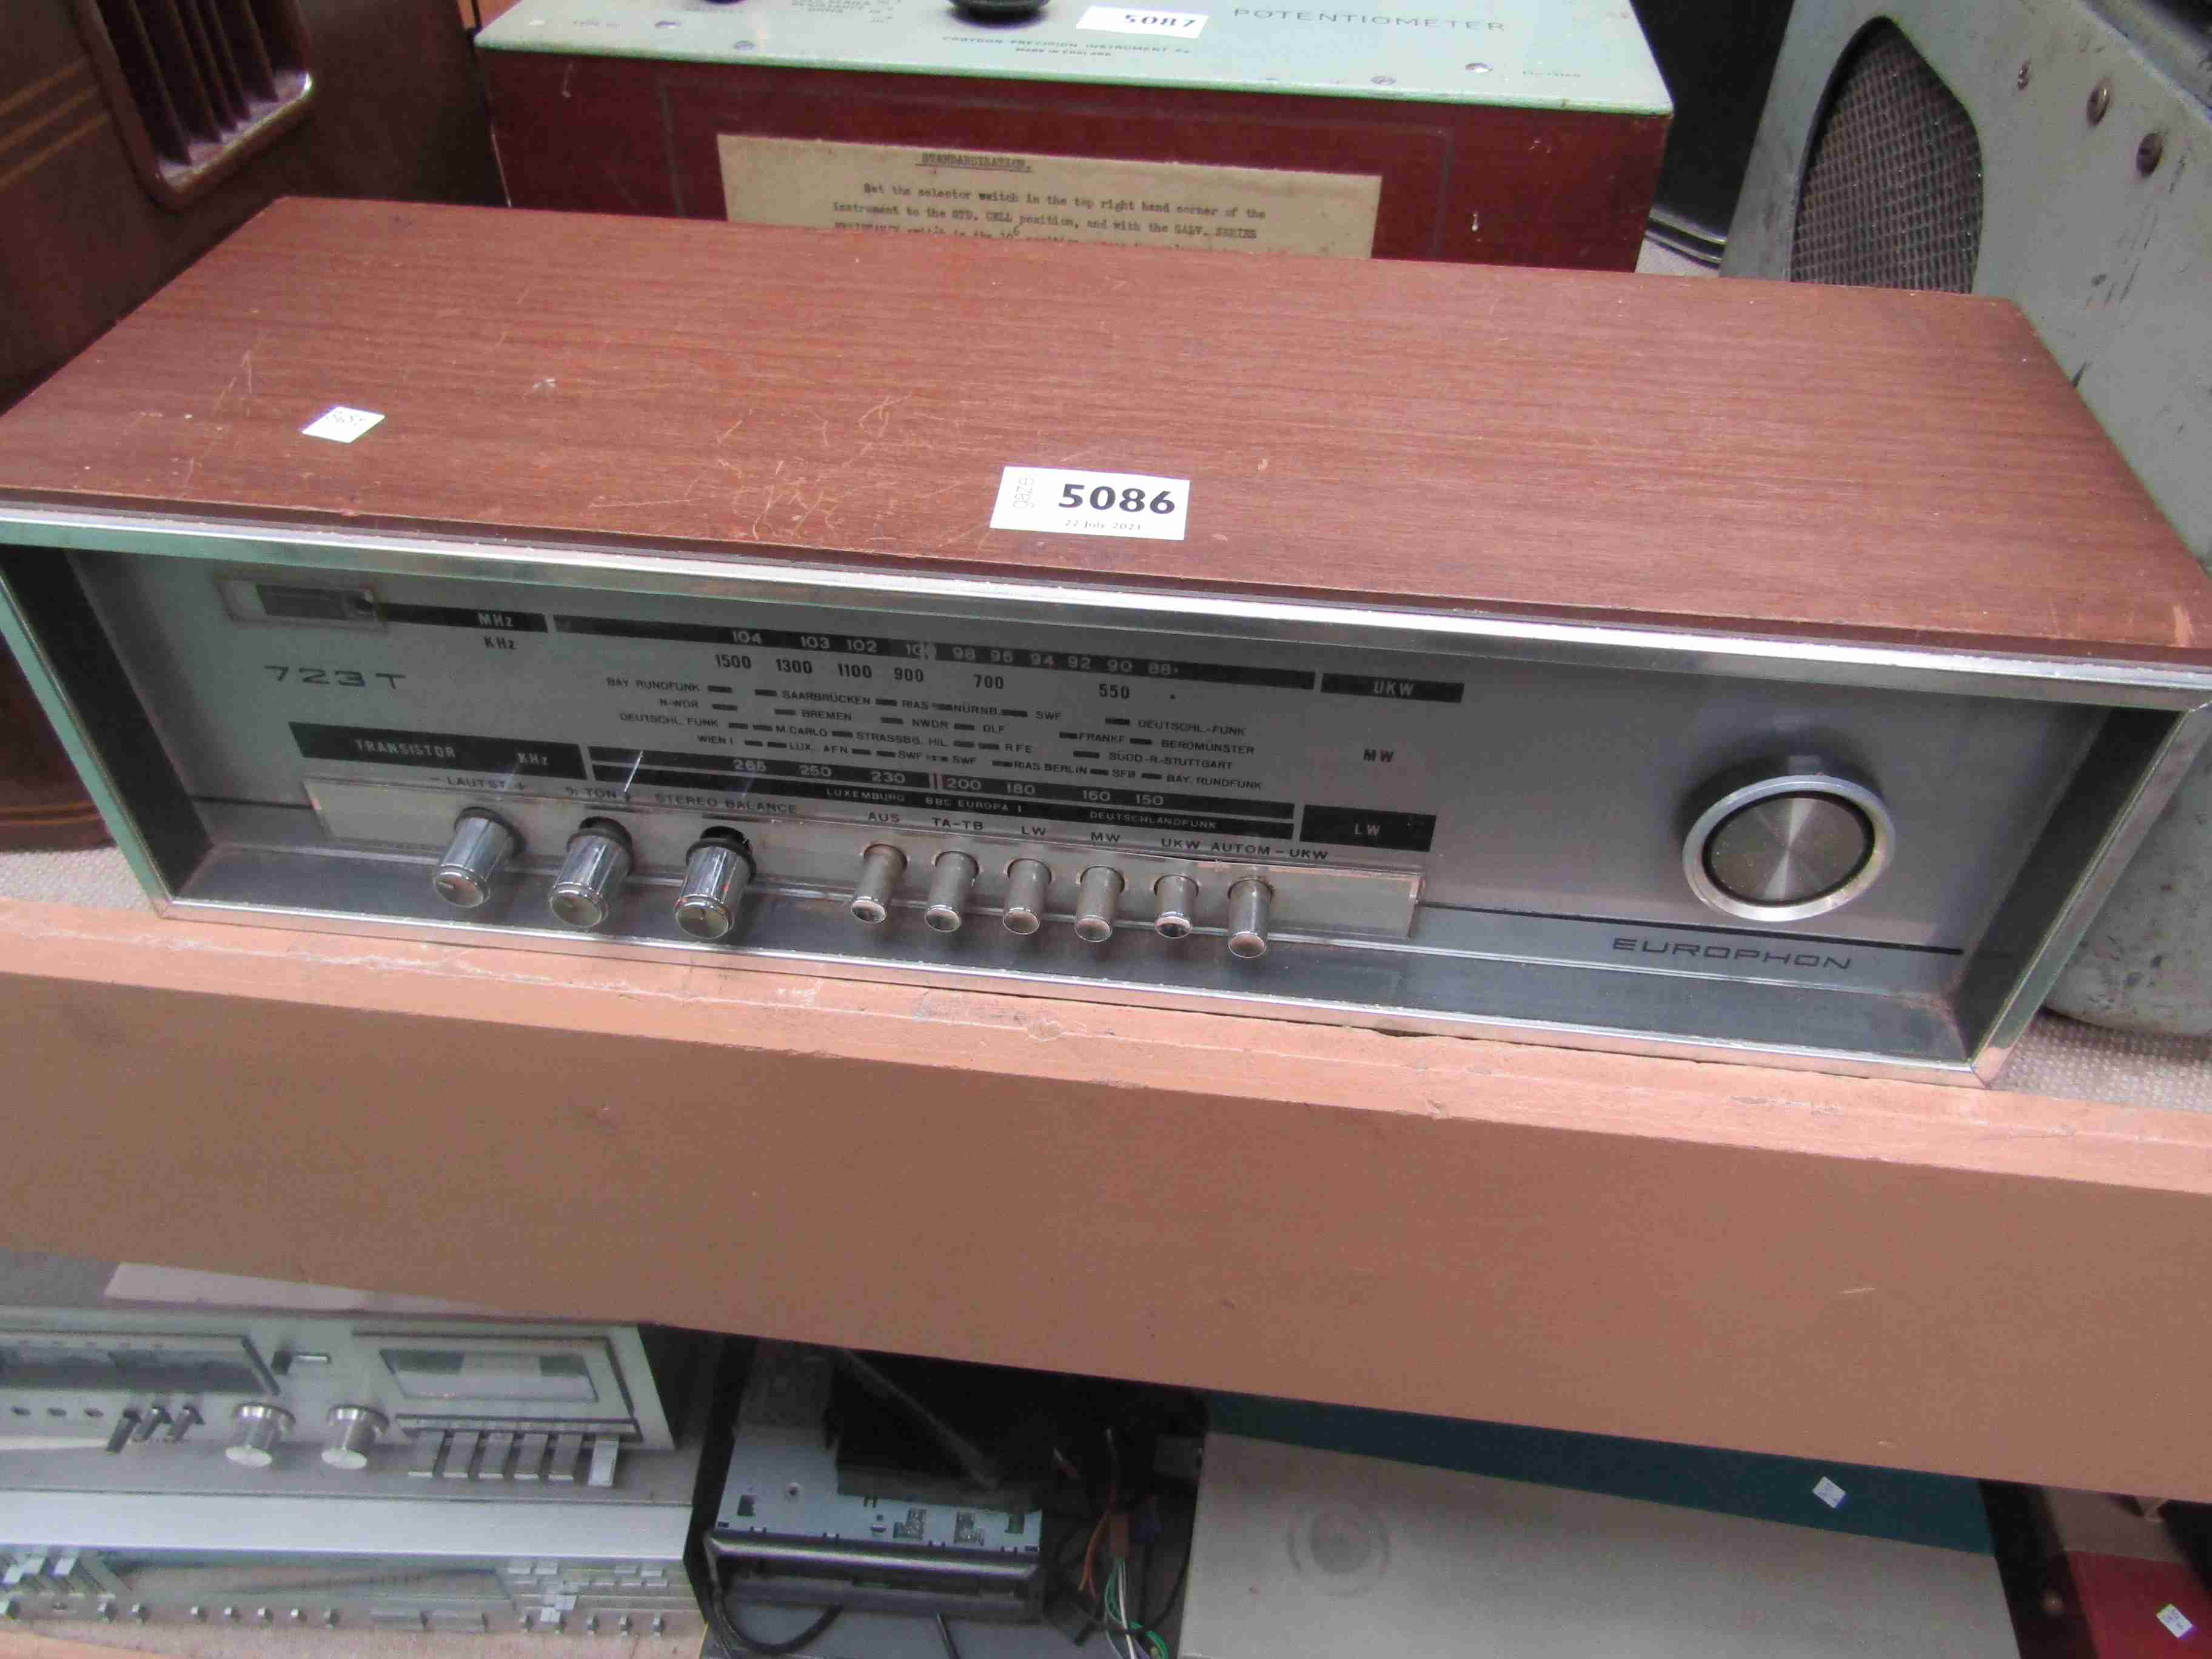 A Europhon 723T transistor radio